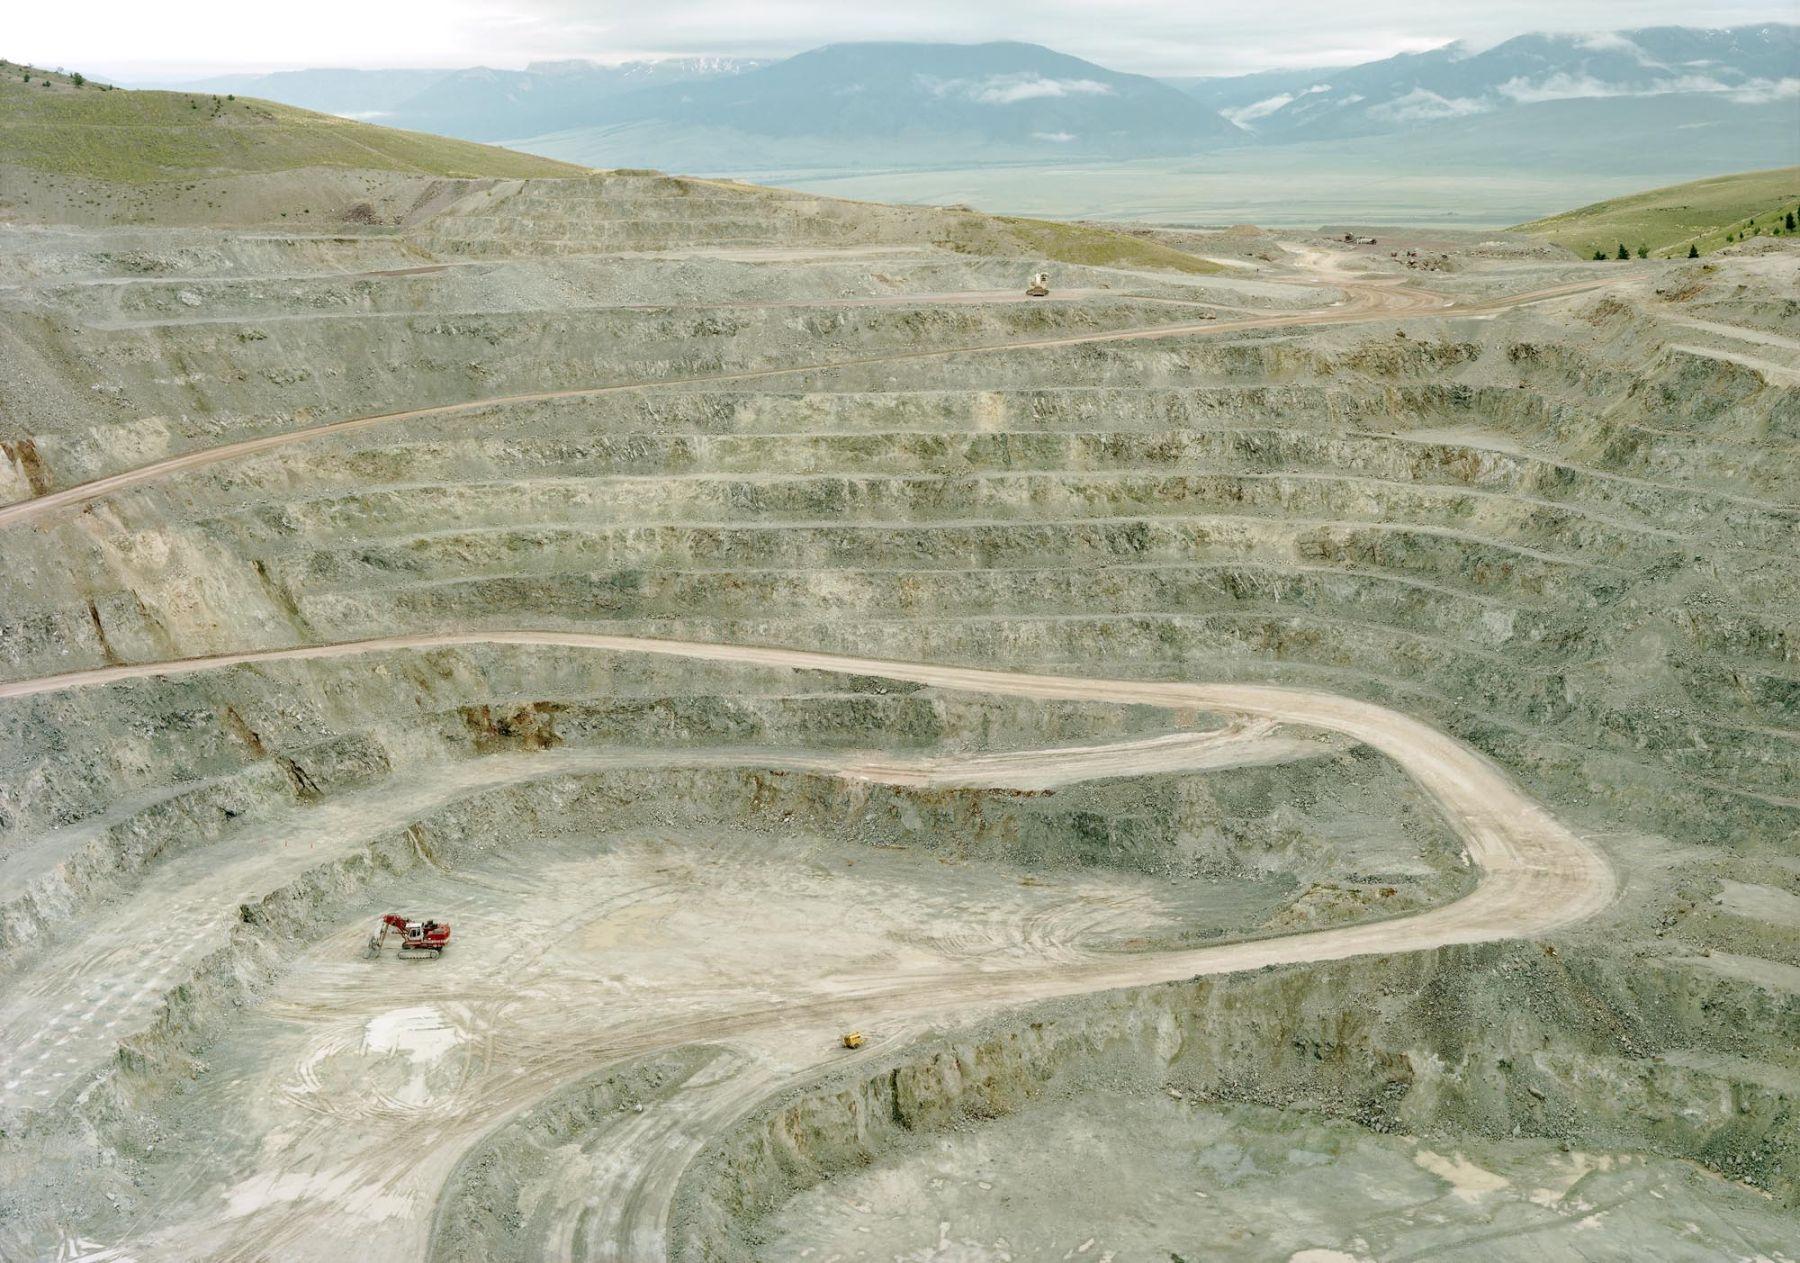 Untitled (Talc mine with truck), Cameron, Montana, 2009, 39 x 55 or 55 x 77 inch chromogenic print